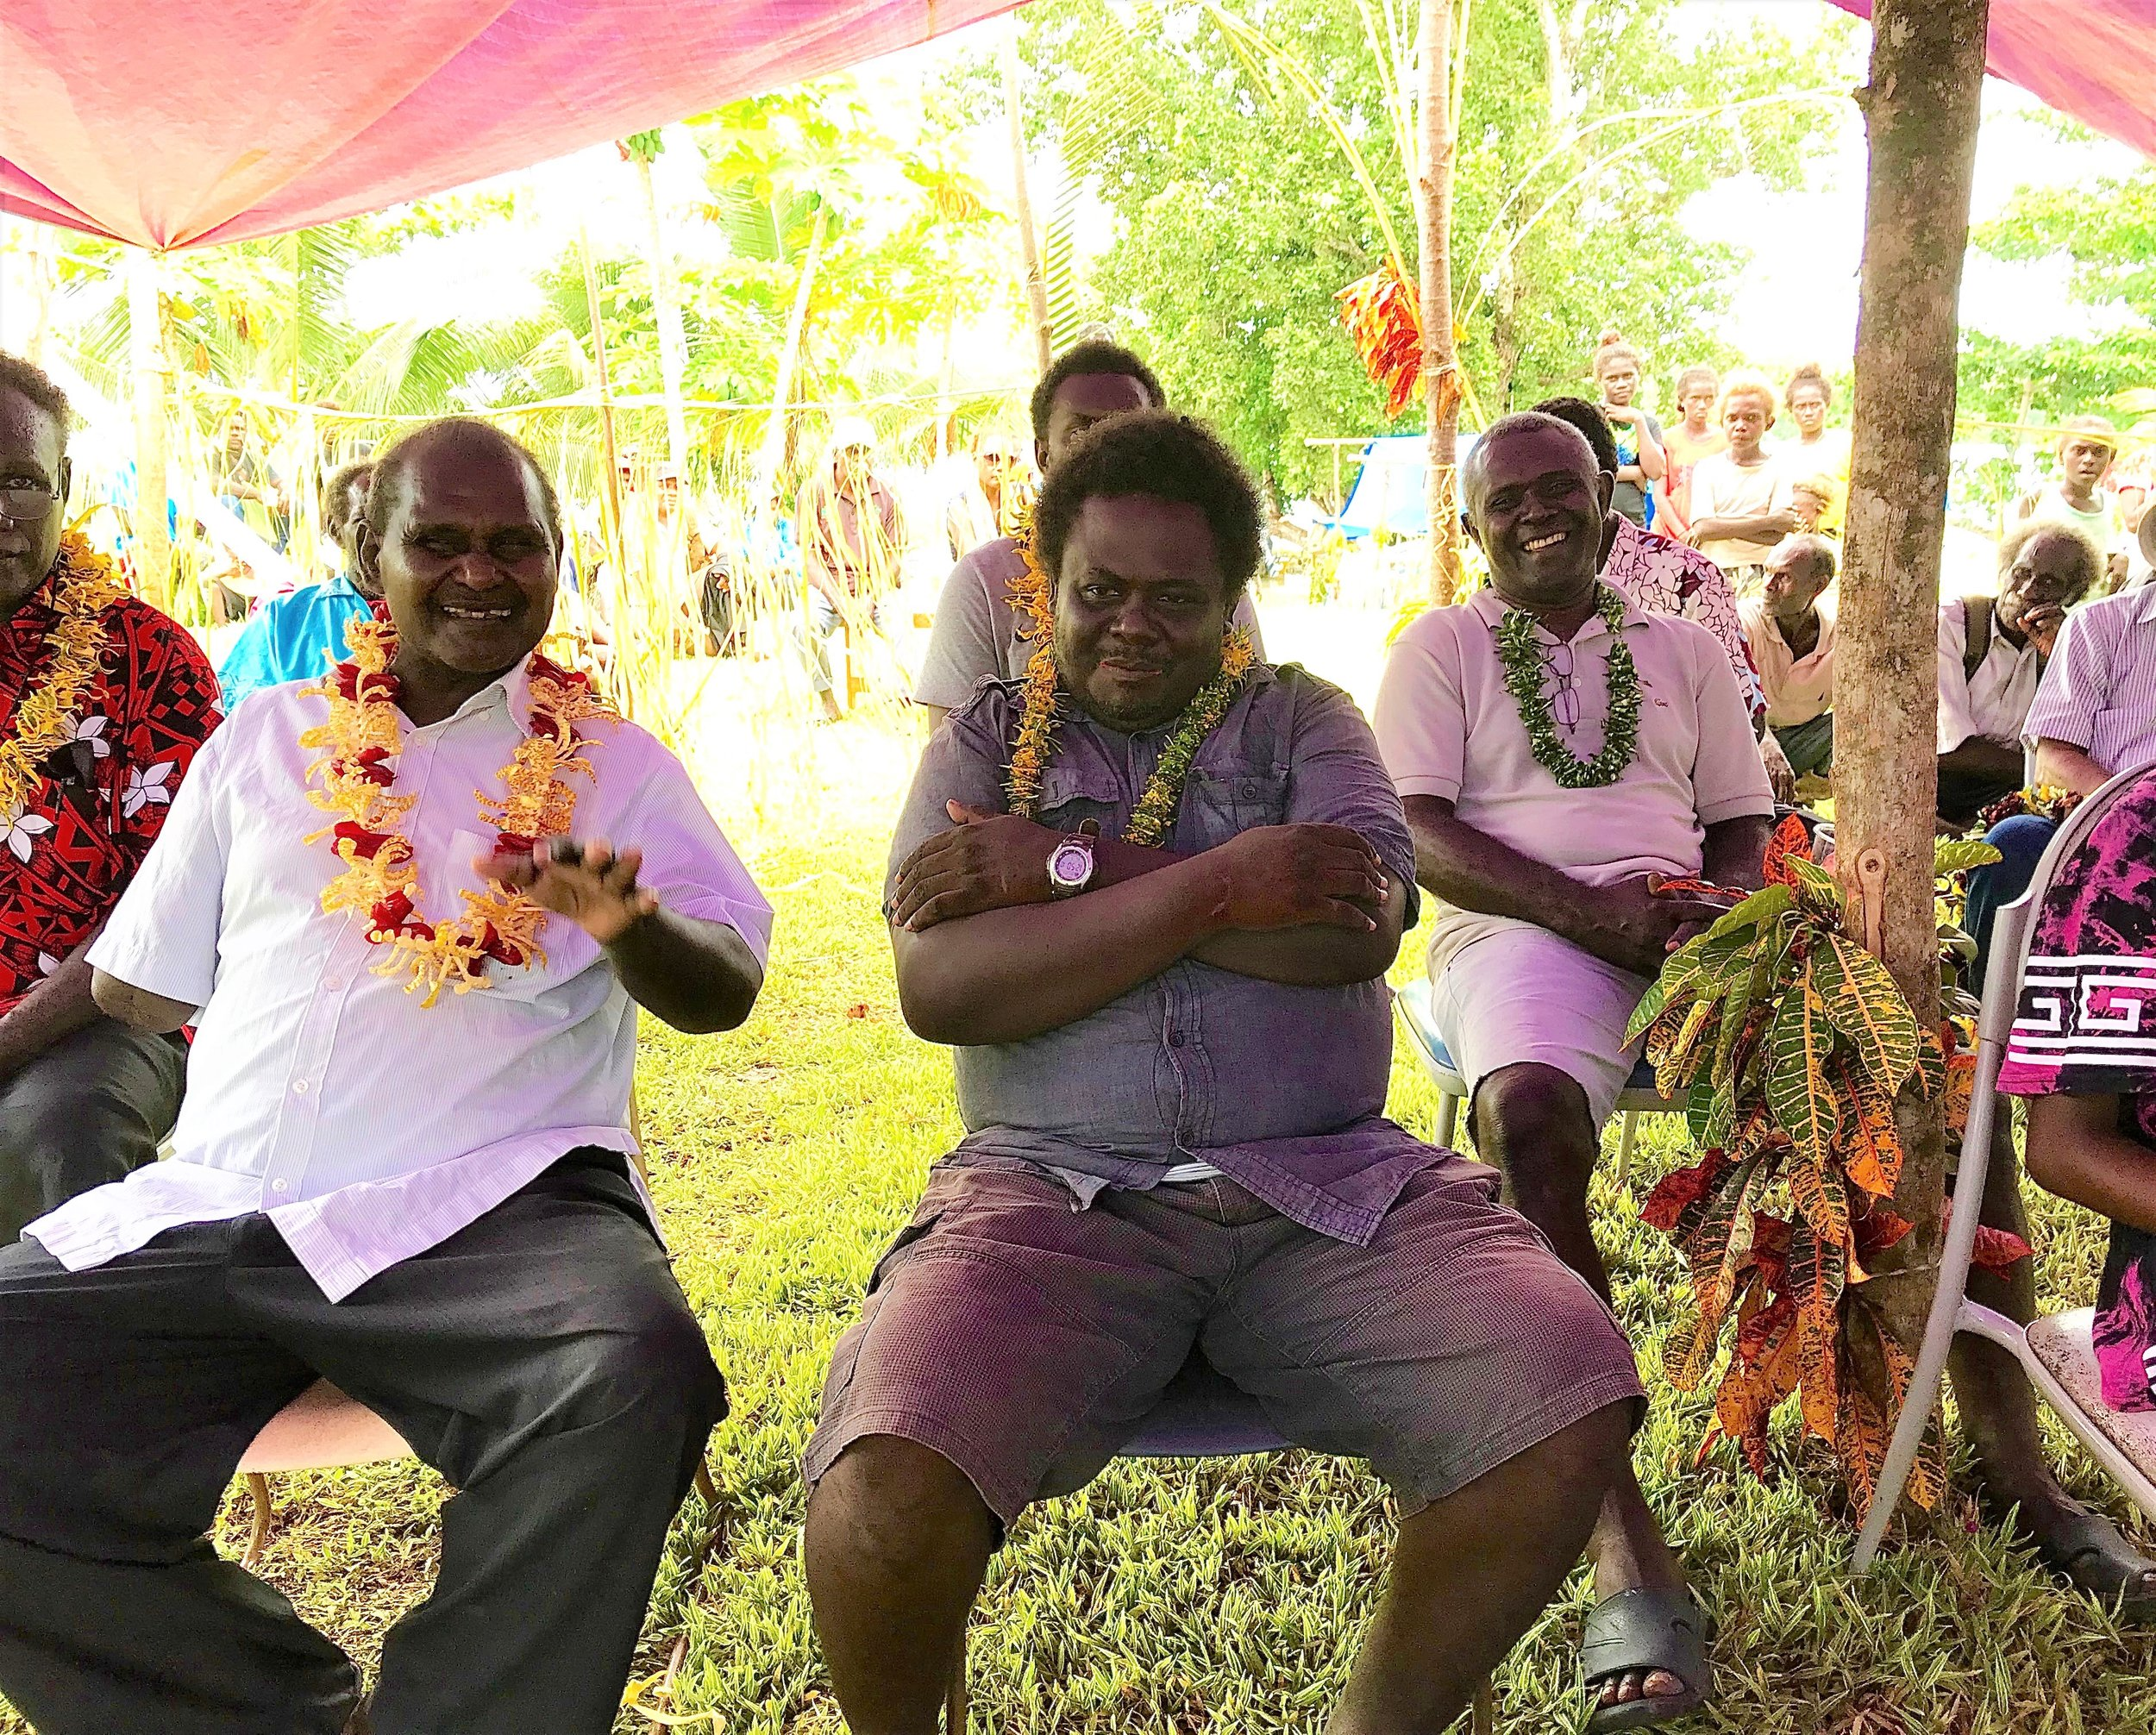 Tribal elders lead the opening ceremony